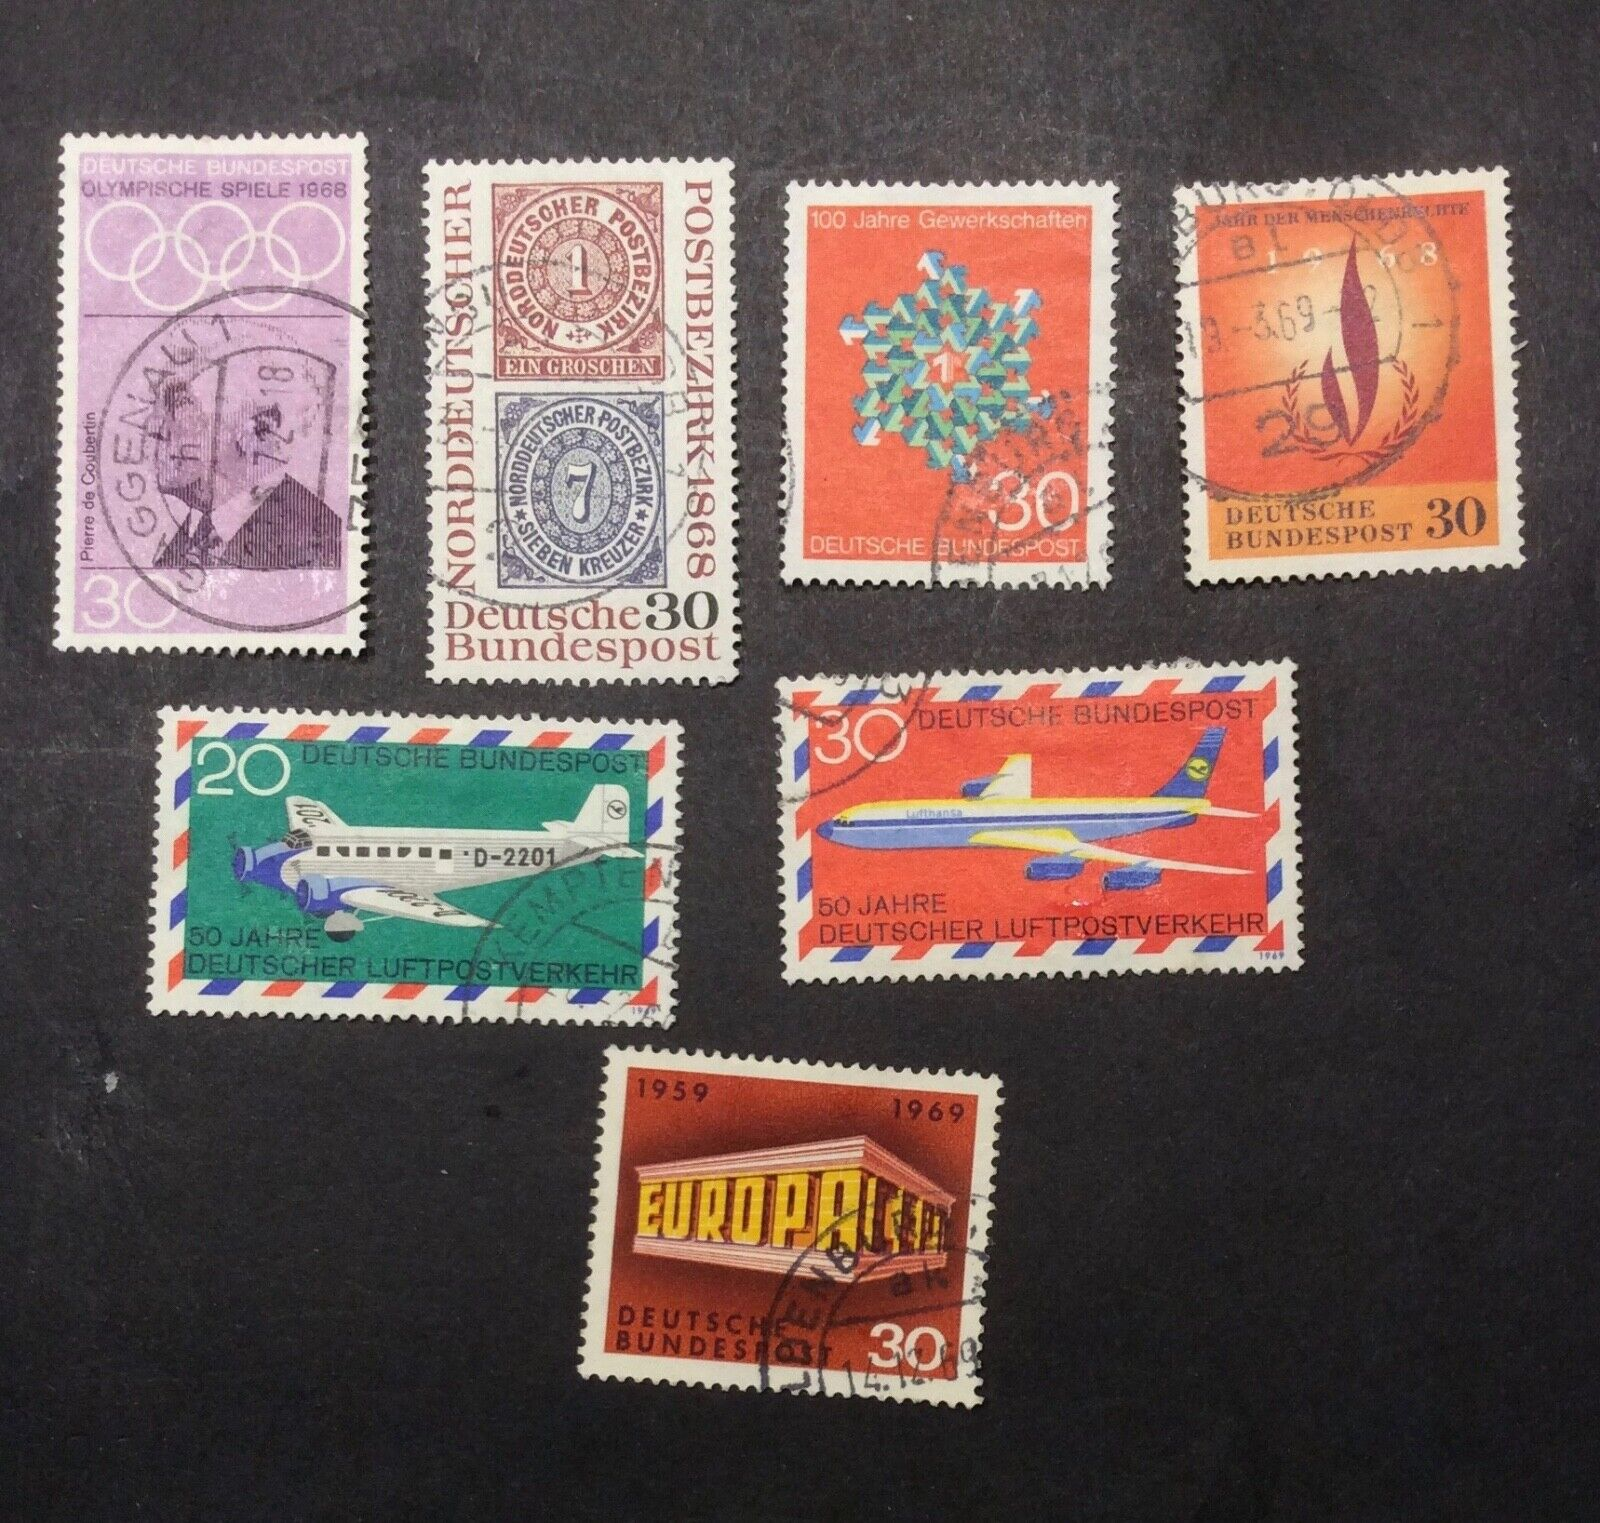 Germany 986, 990- 994, 997, Used, Hinged - $1.00